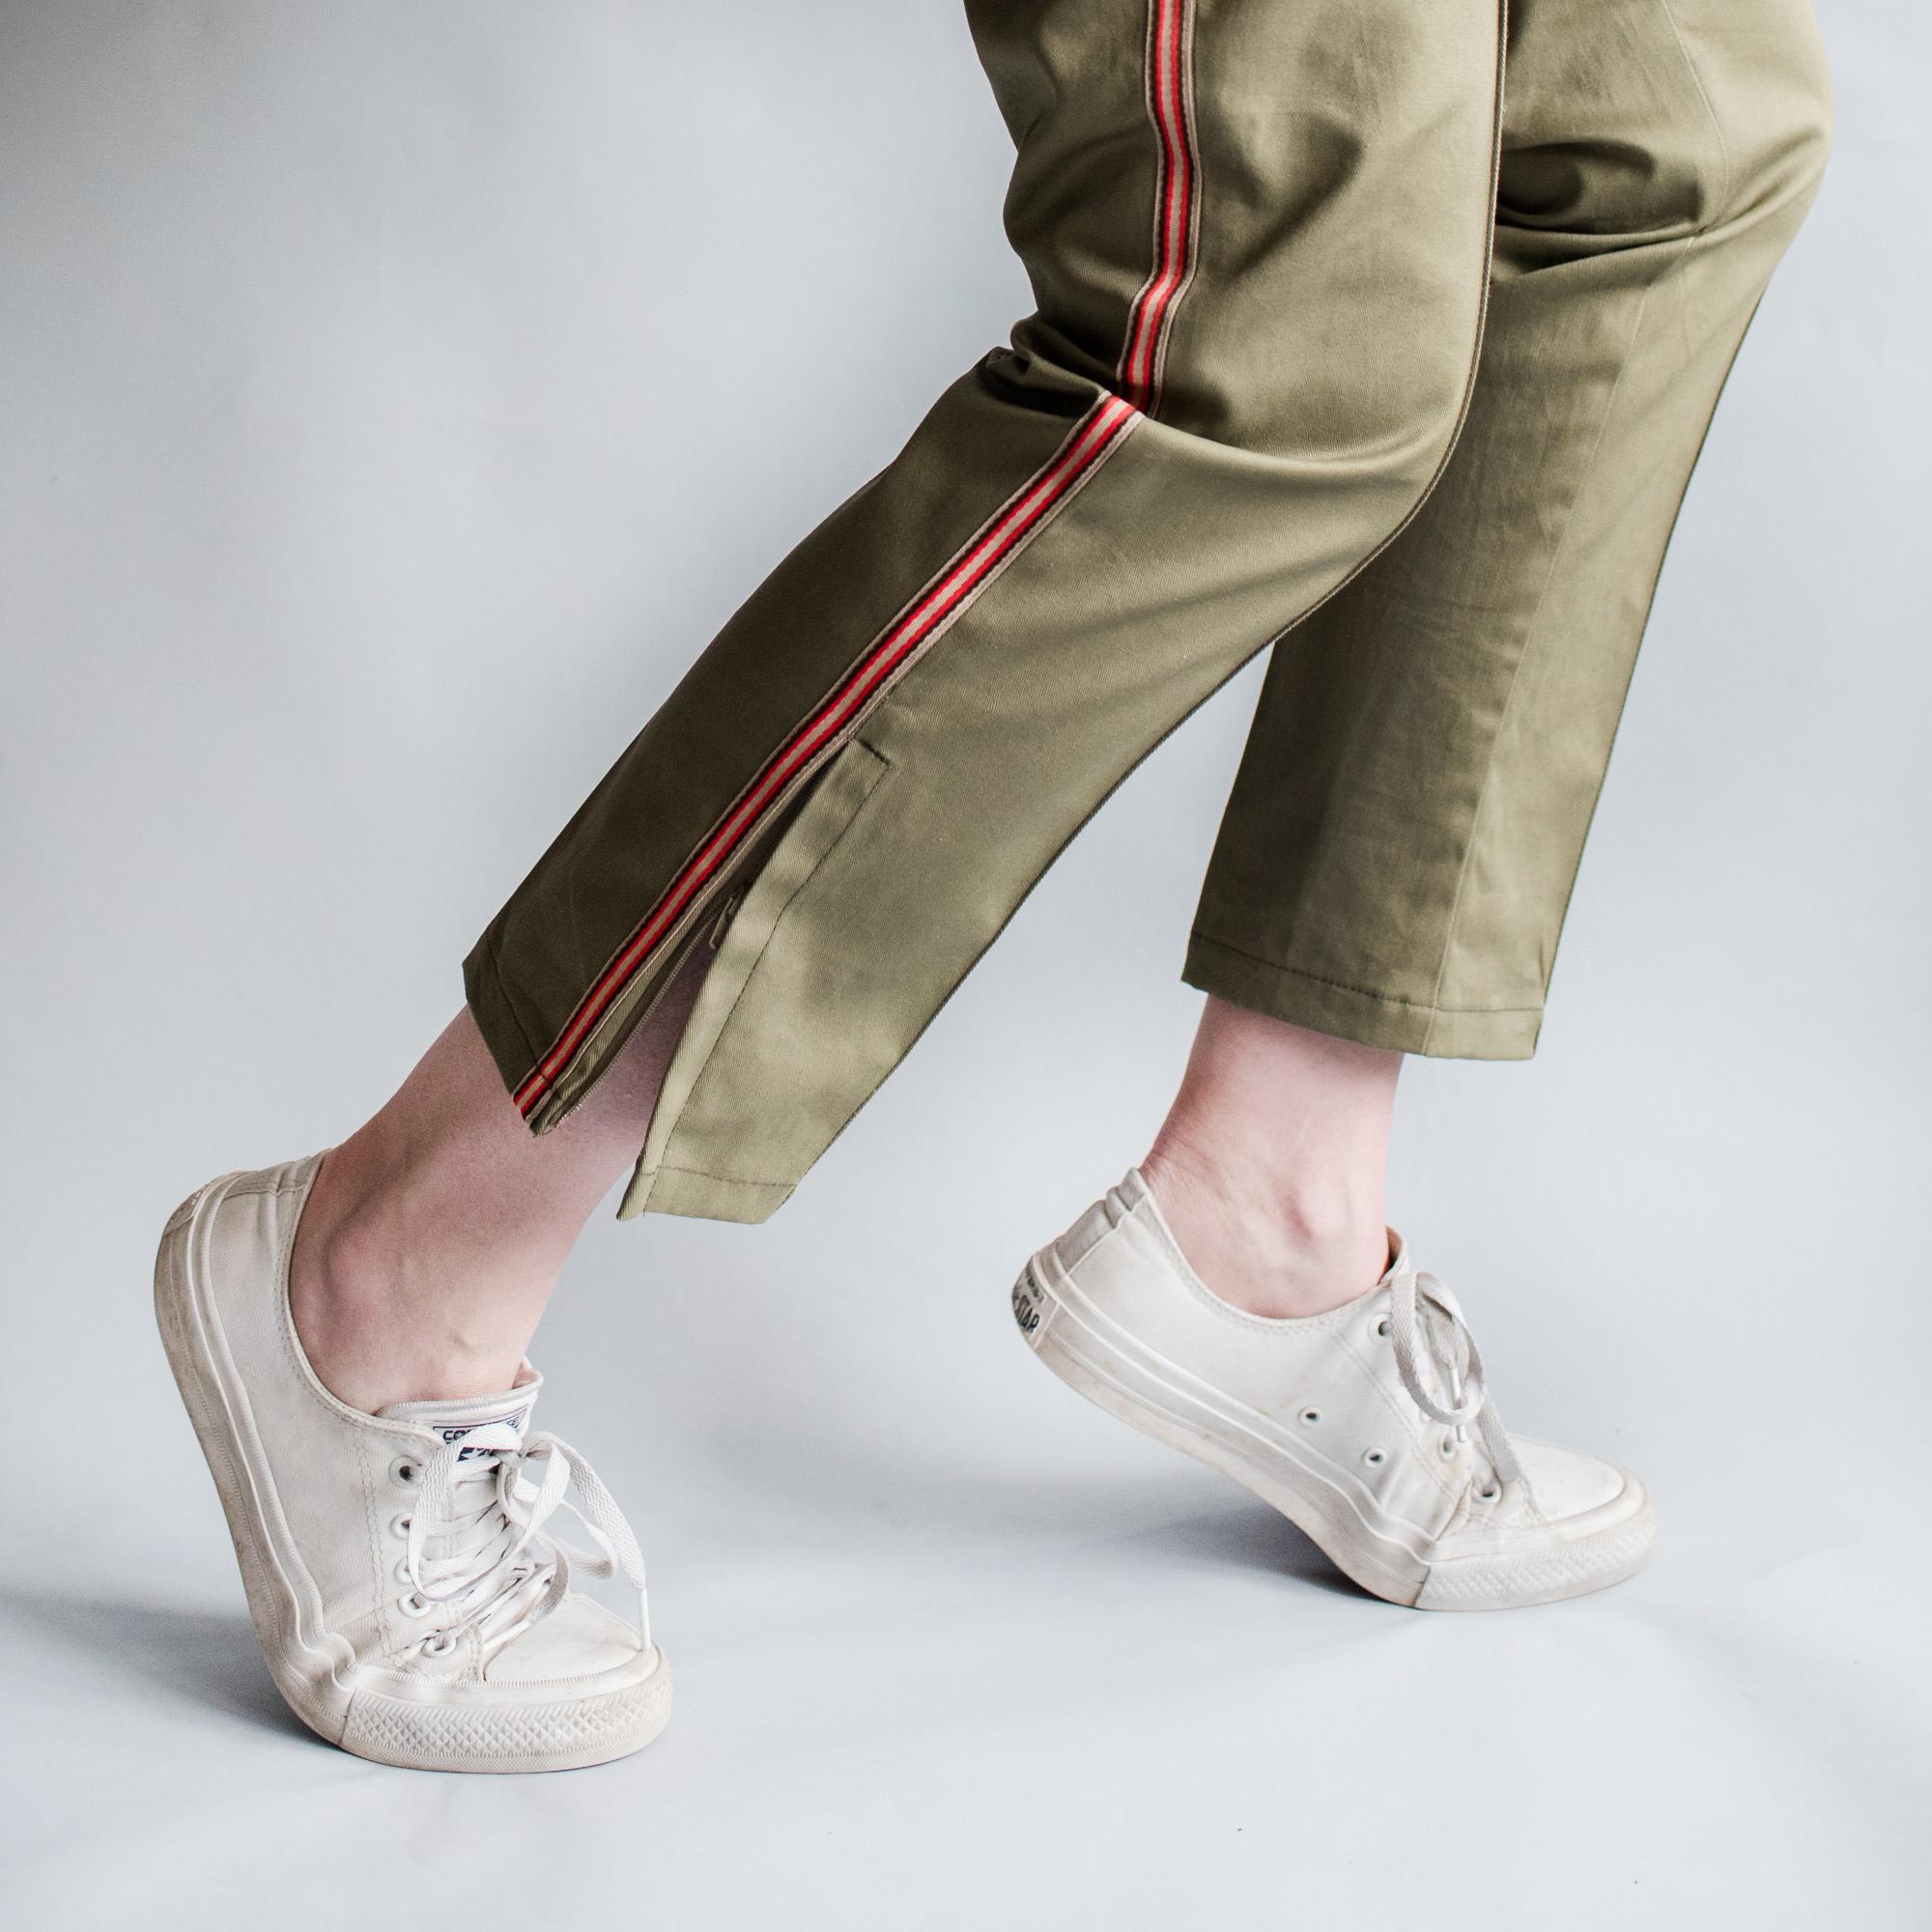 robinson-pdf-sewing-trouser29.jpg